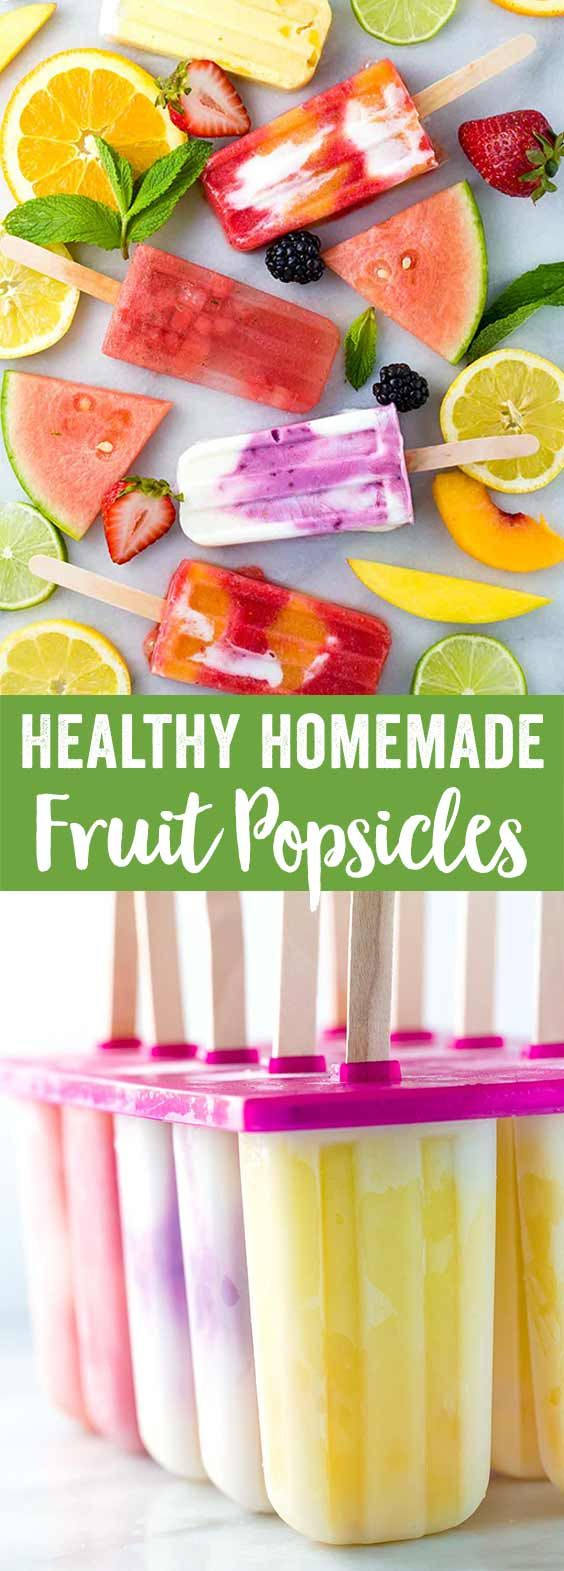 Healthy Homemade Fruit Popsicles